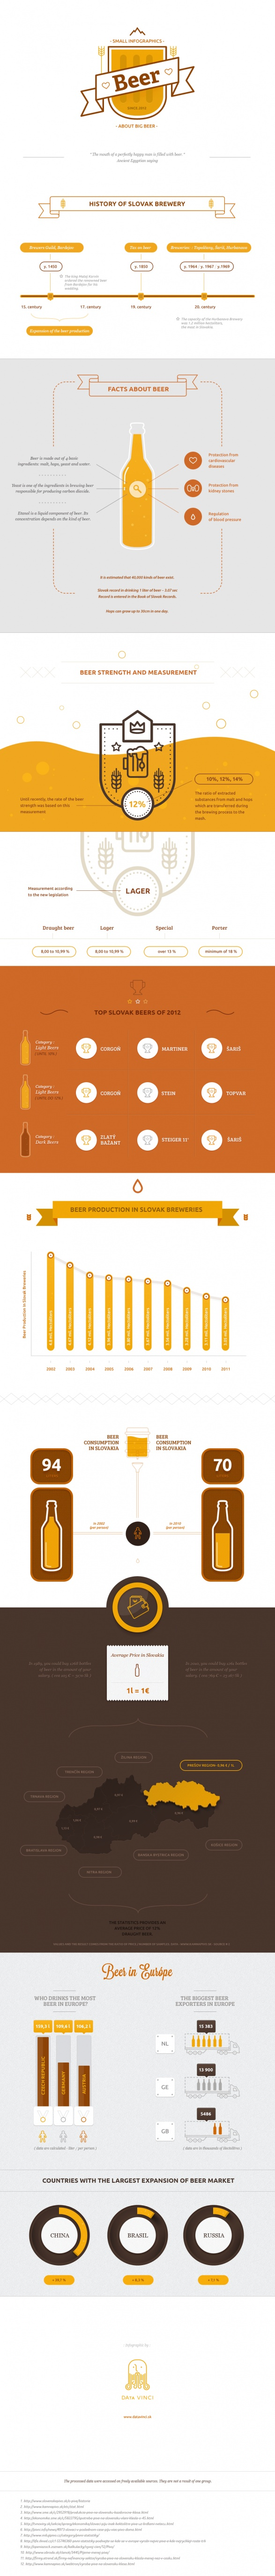 Slovak Beer infographic by DAtaVINCI